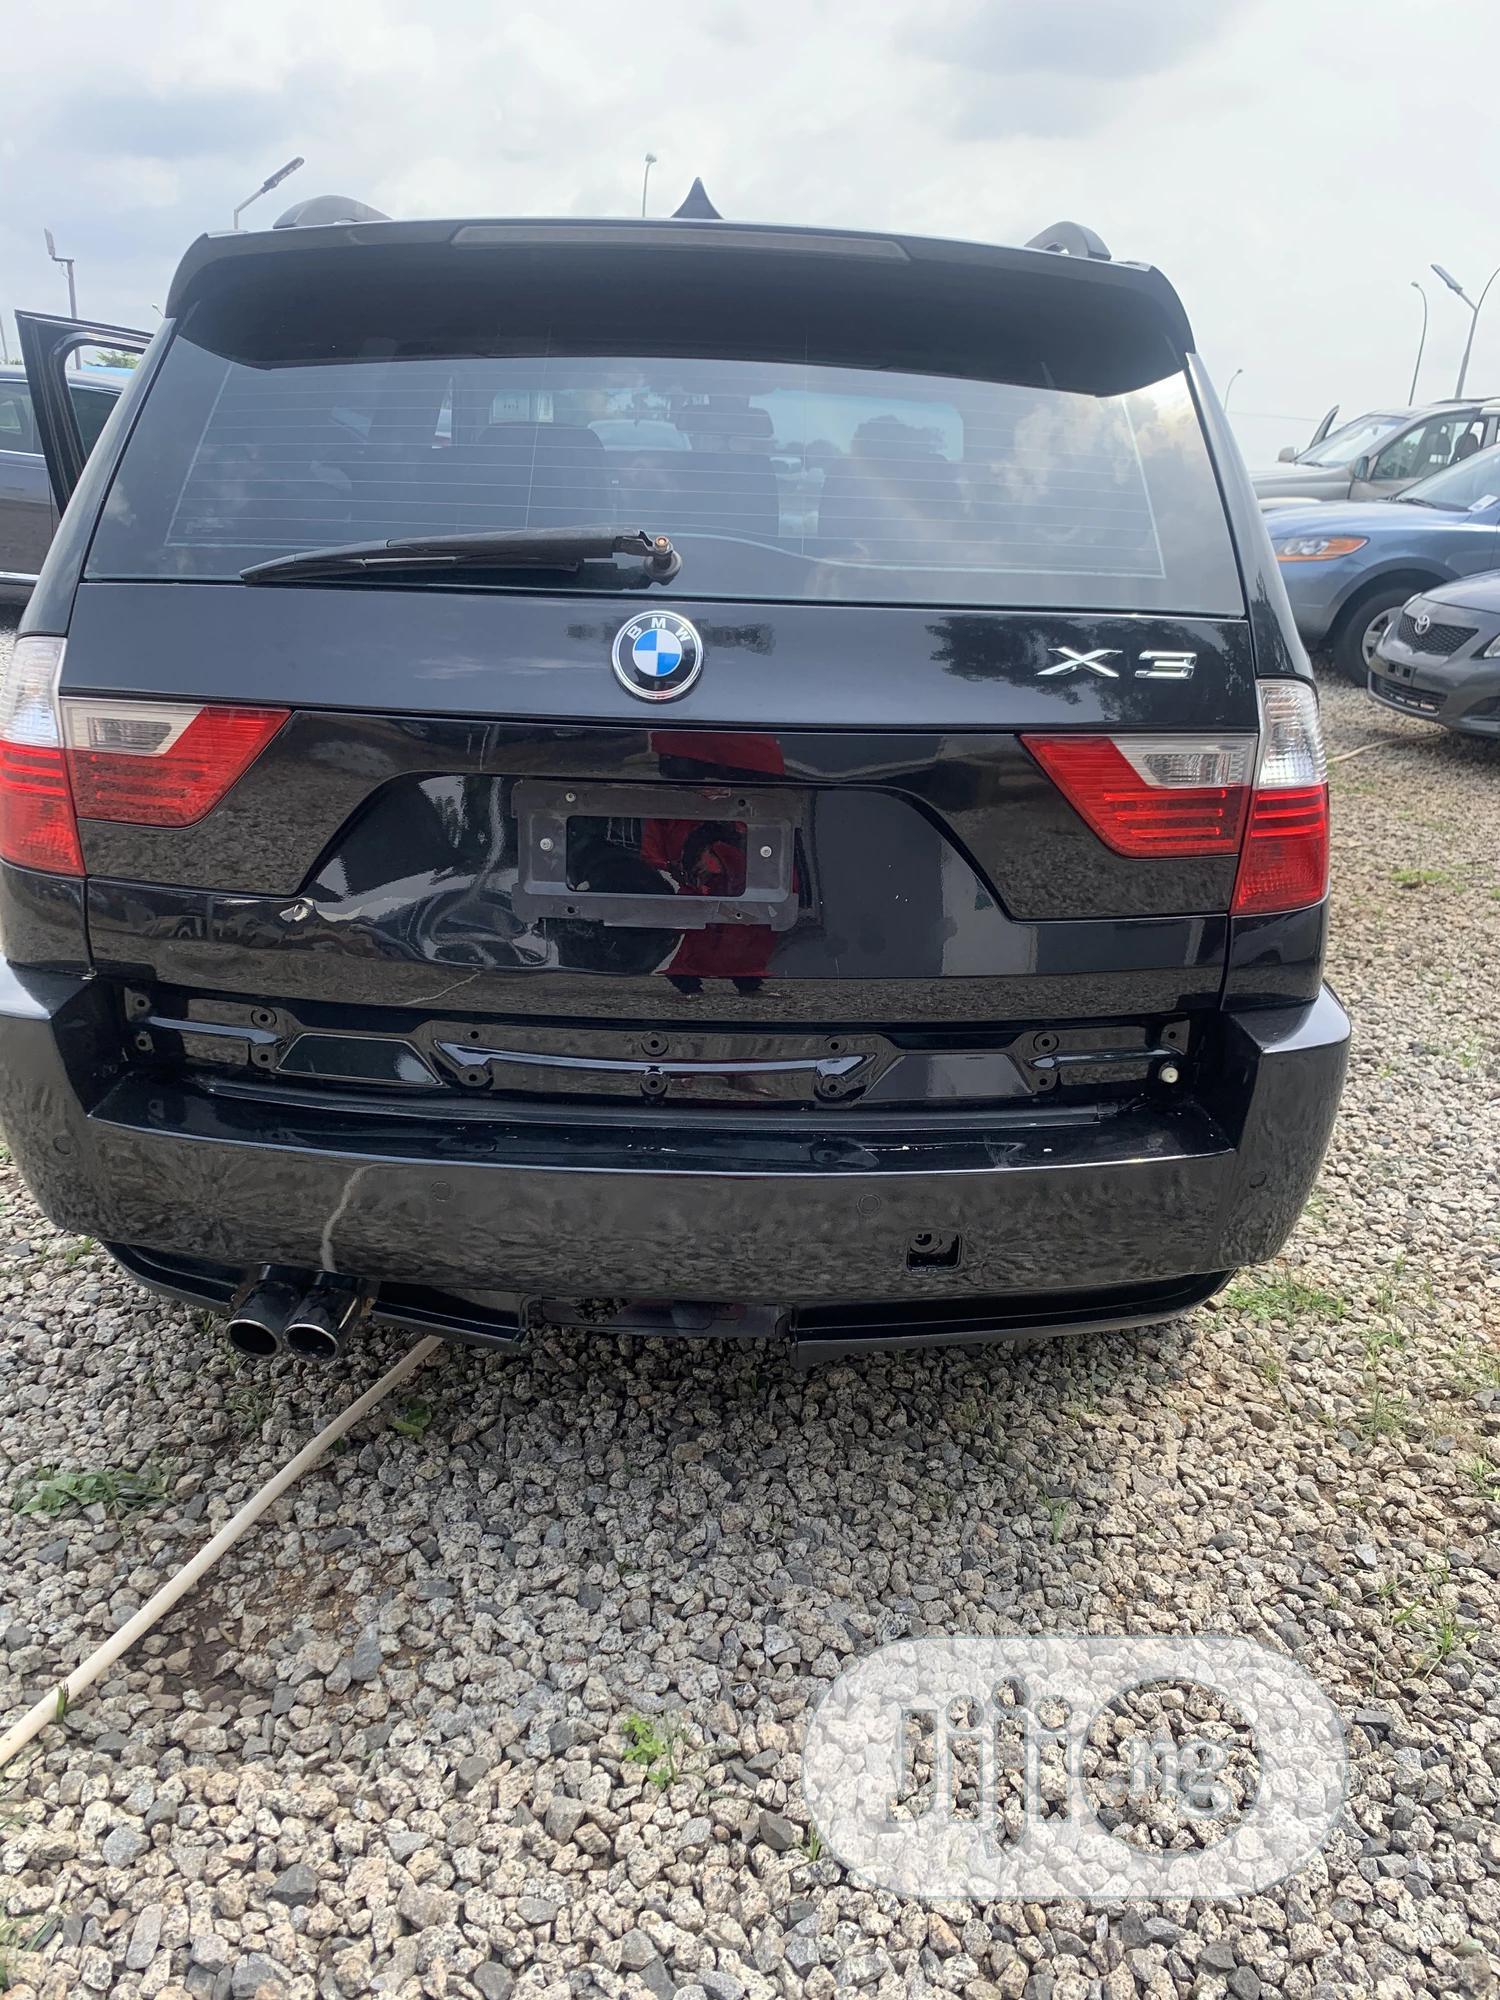 Archive: BMW X3 2008 3.0si Automatic Black